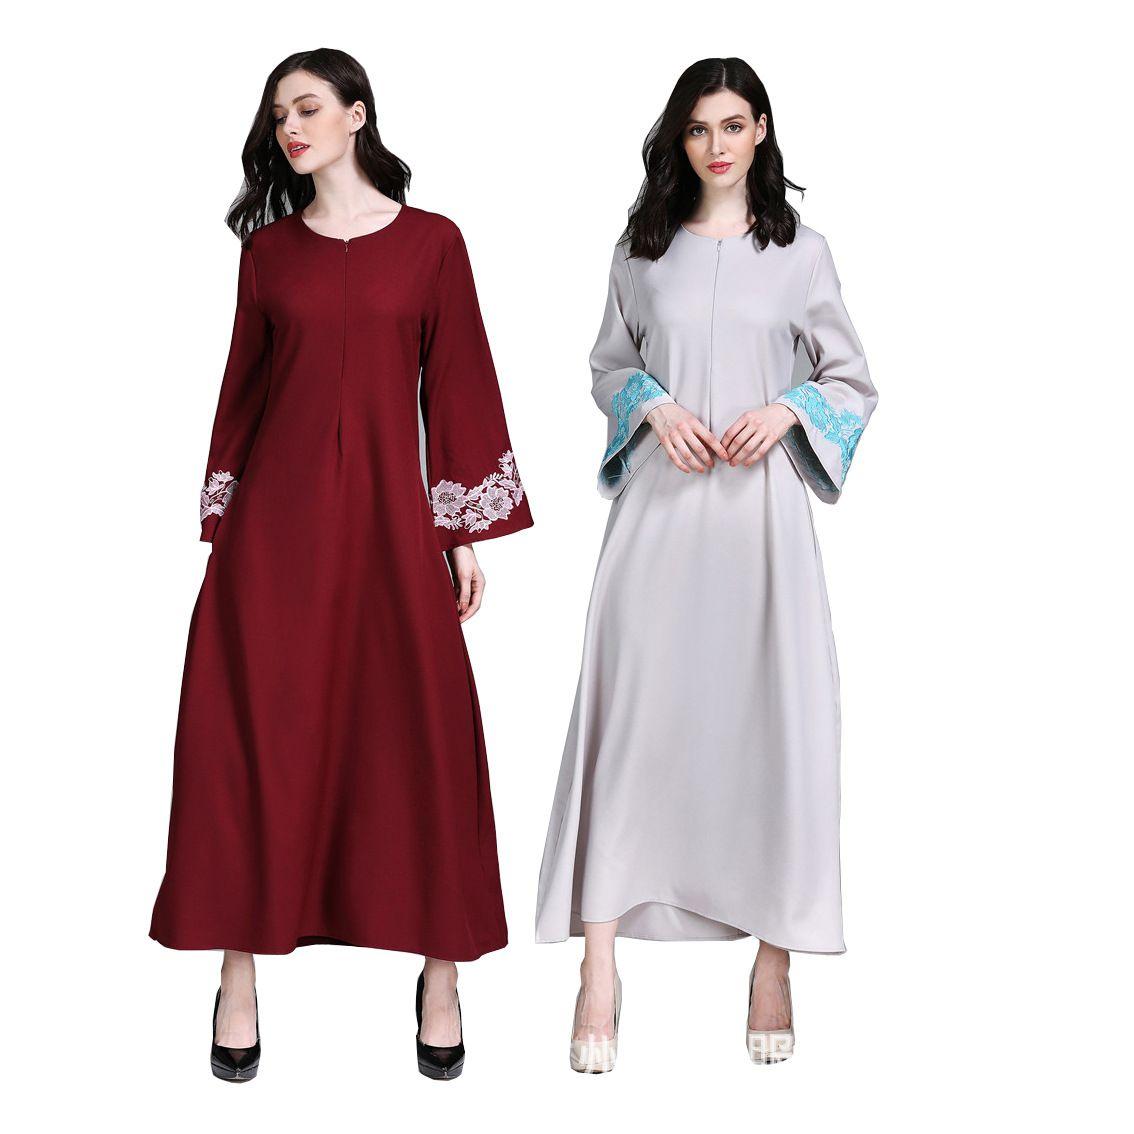 Abaya Cardigan Lace Printed Hollow Muslim Dress Turkish Islamic Clothing Robe Dubai Caftan Abayas For Women Bangladesh Kaftan Attractive Appearance Activity & Gear